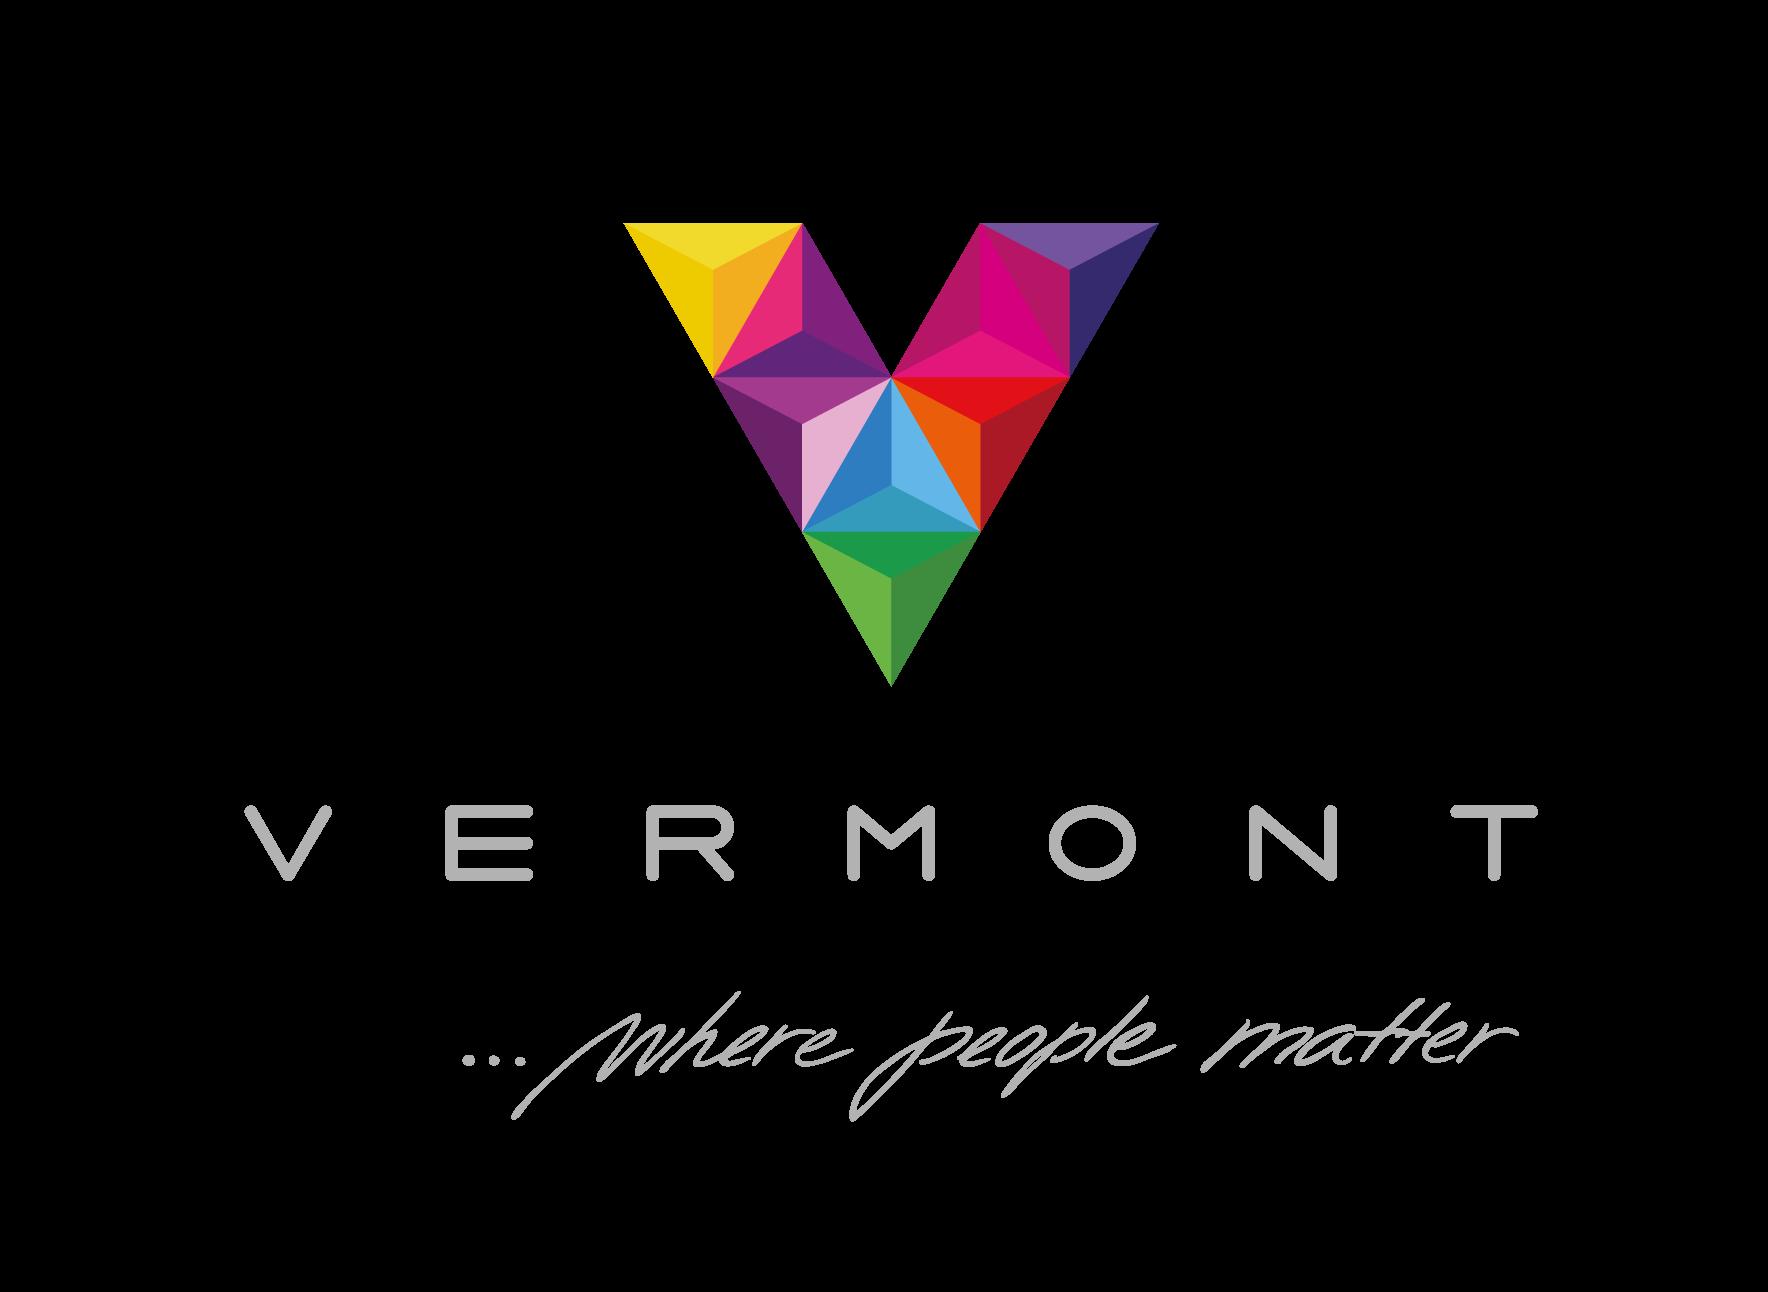 www.vermont.eu - logo